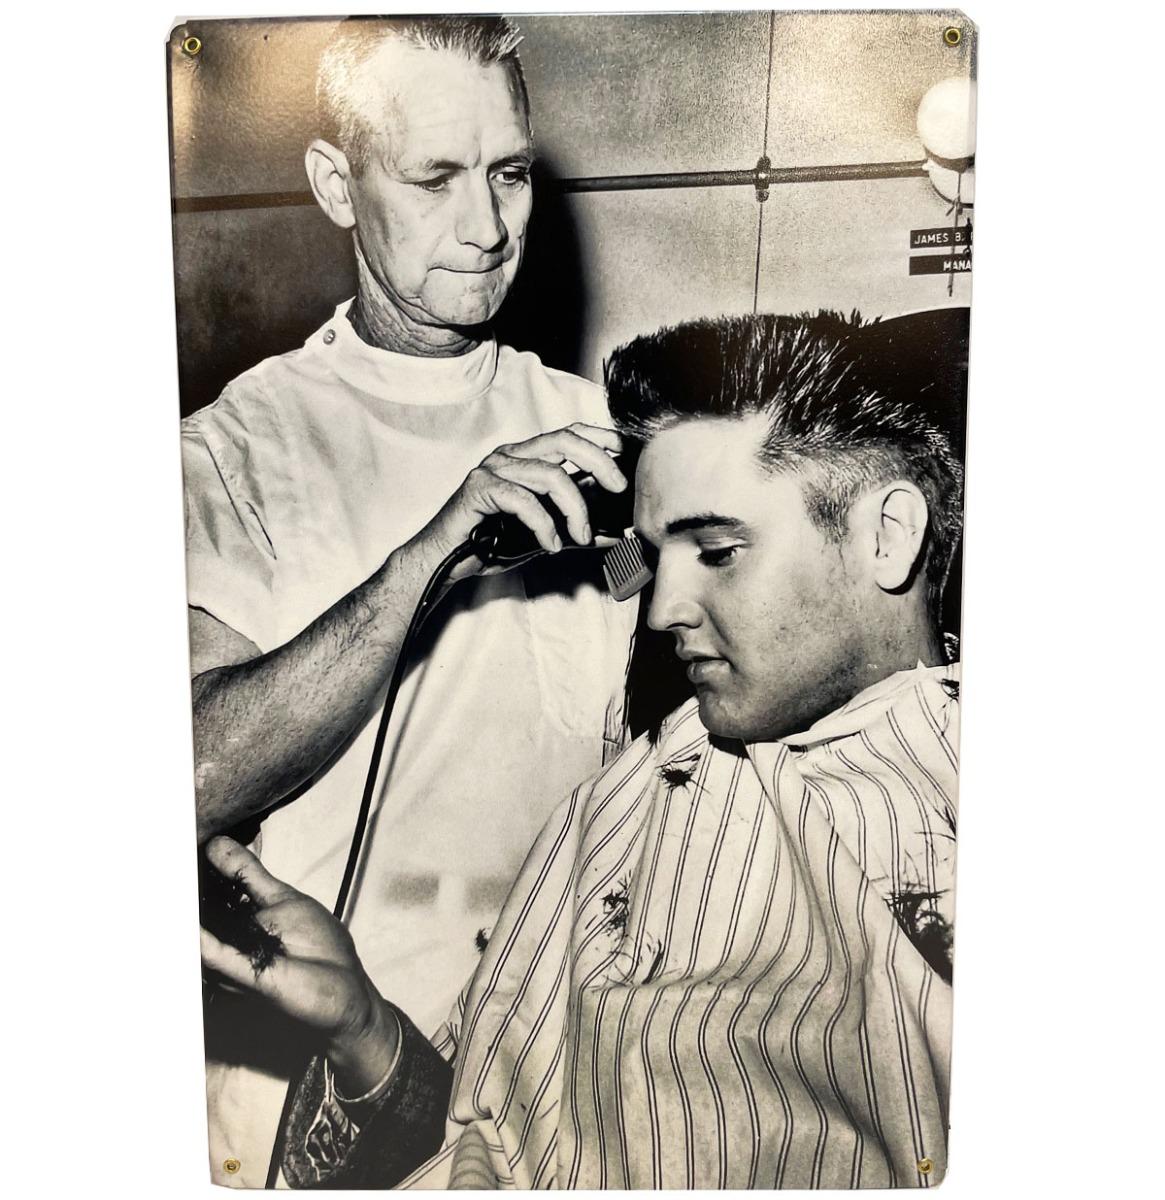 Elvis Presley Getting Haircut - Metalen Bord 29.5 x 44.5 cm